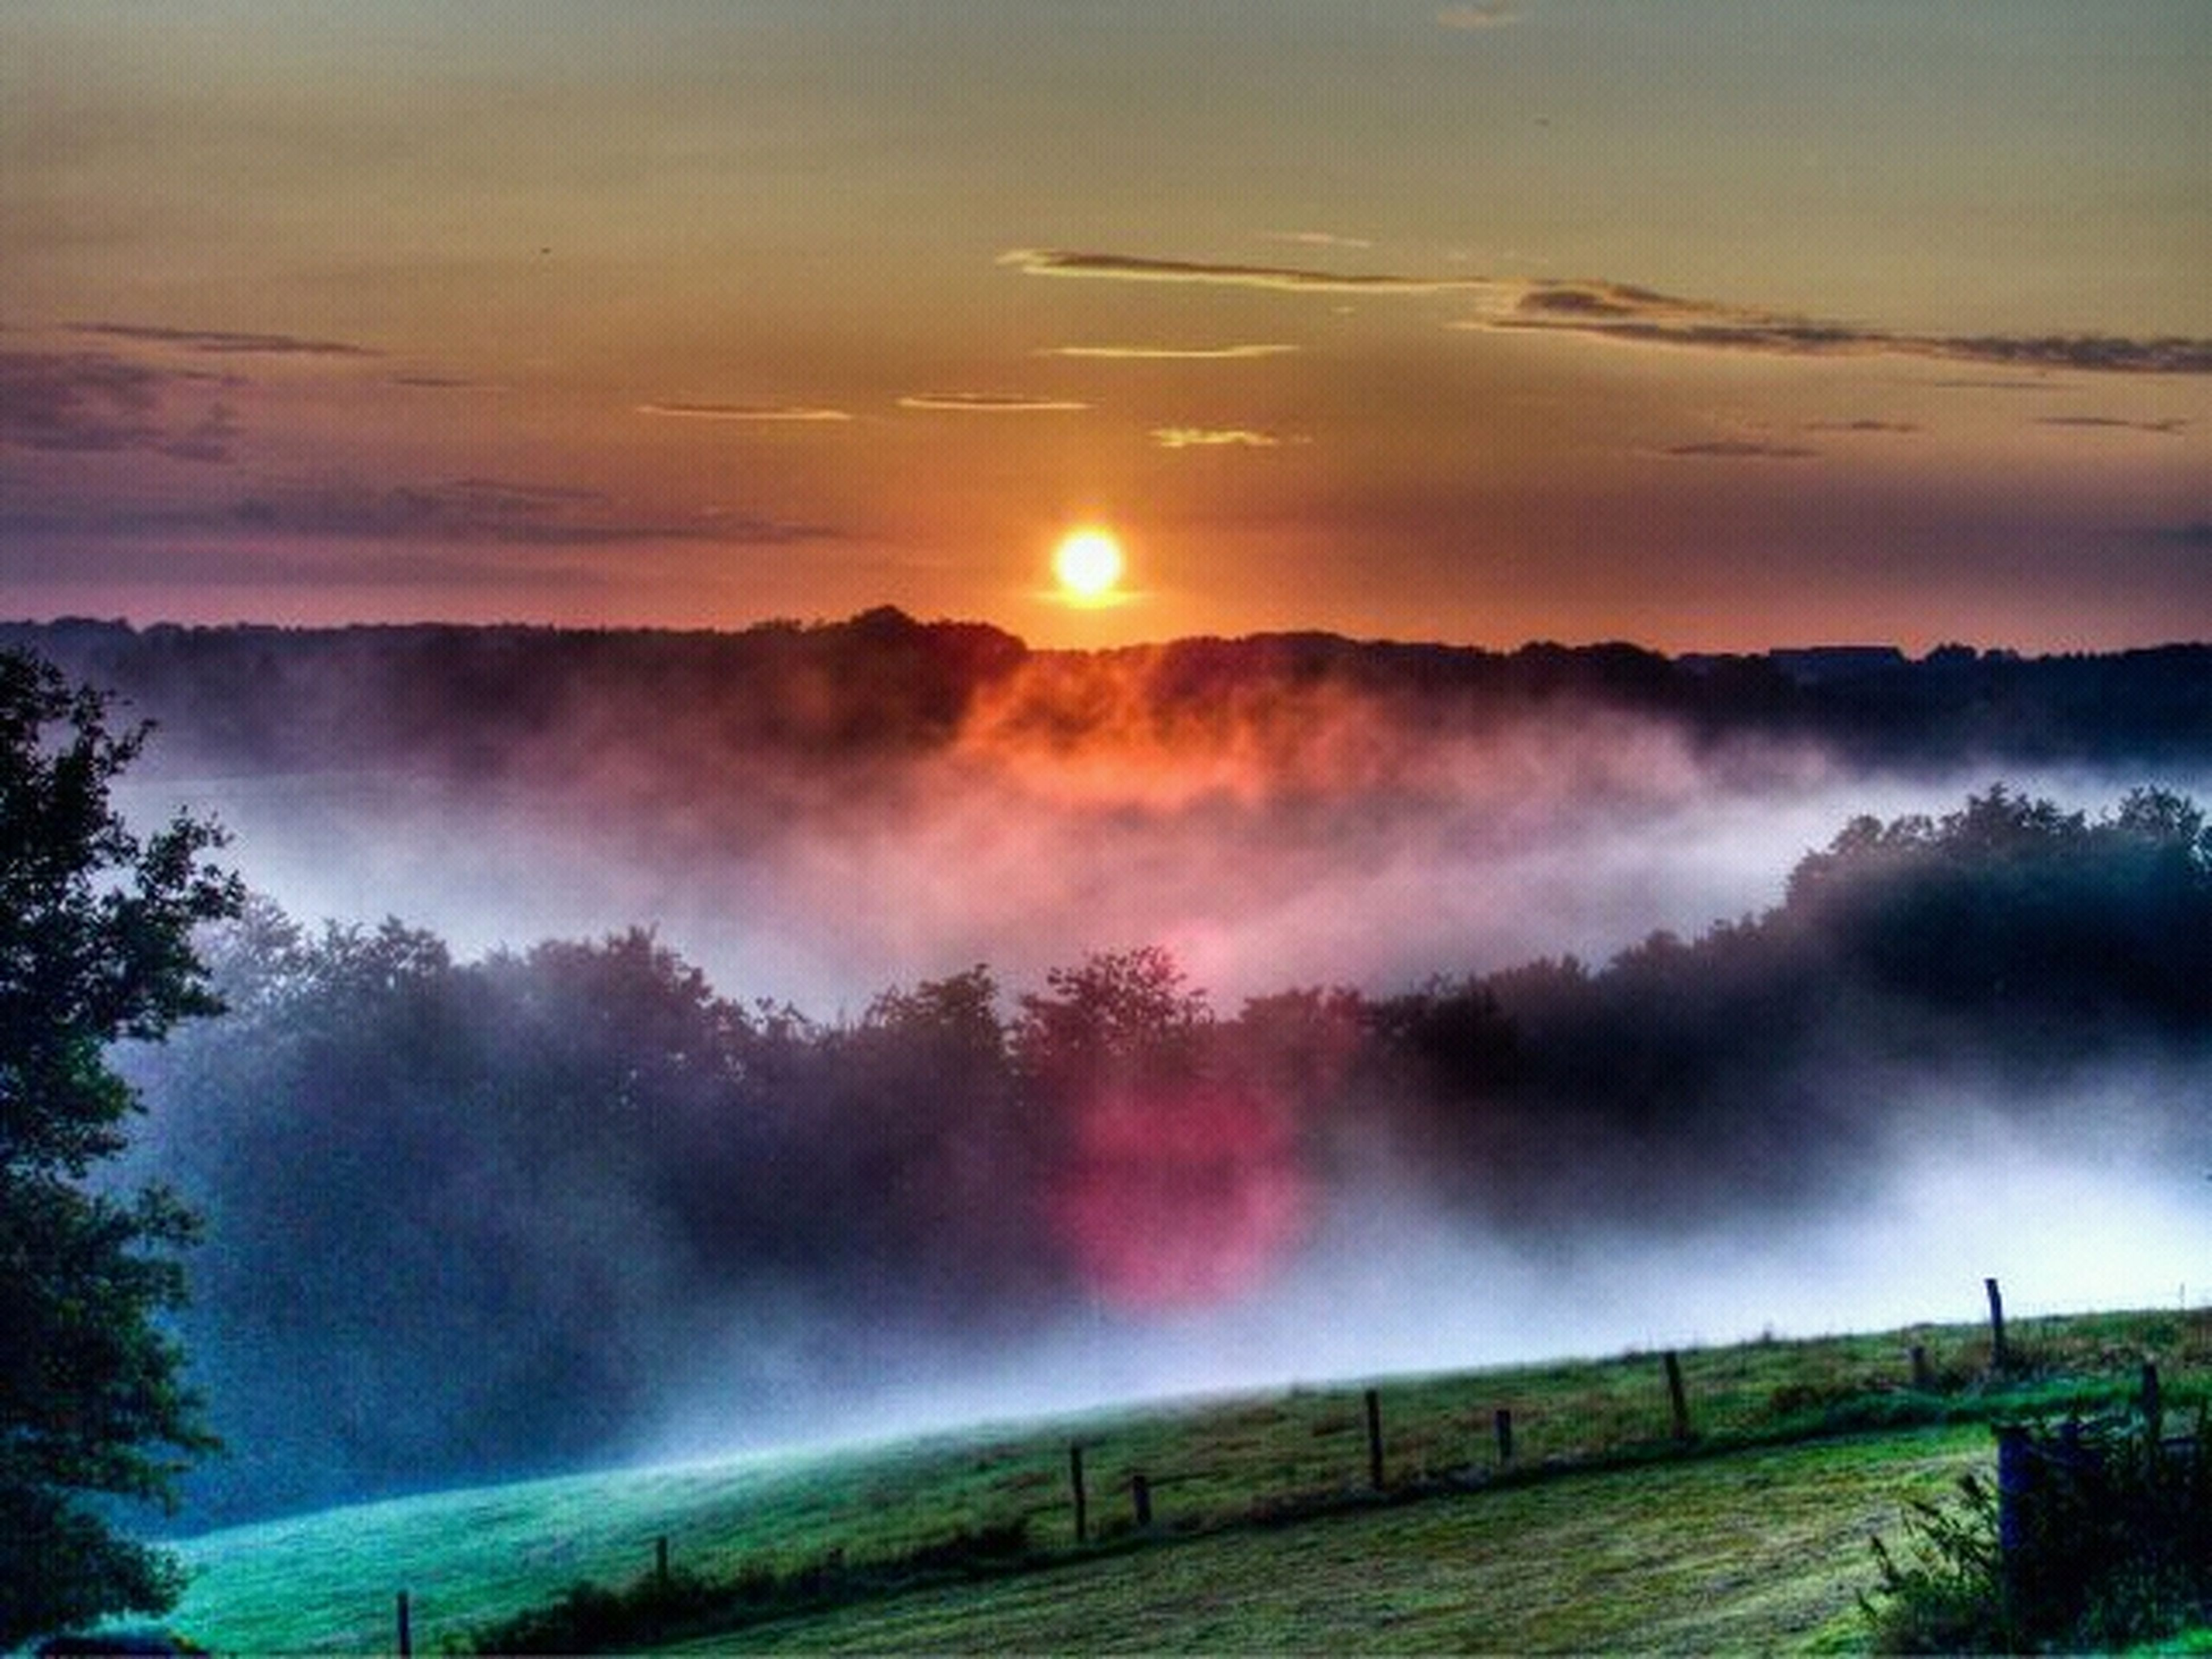 scenics, tranquil scene, sunset, beauty in nature, tranquility, landscape, fog, nature, sky, idyllic, weather, mountain, sun, foggy, field, cloud - sky, non-urban scene, orange color, sunbeam, rural scene